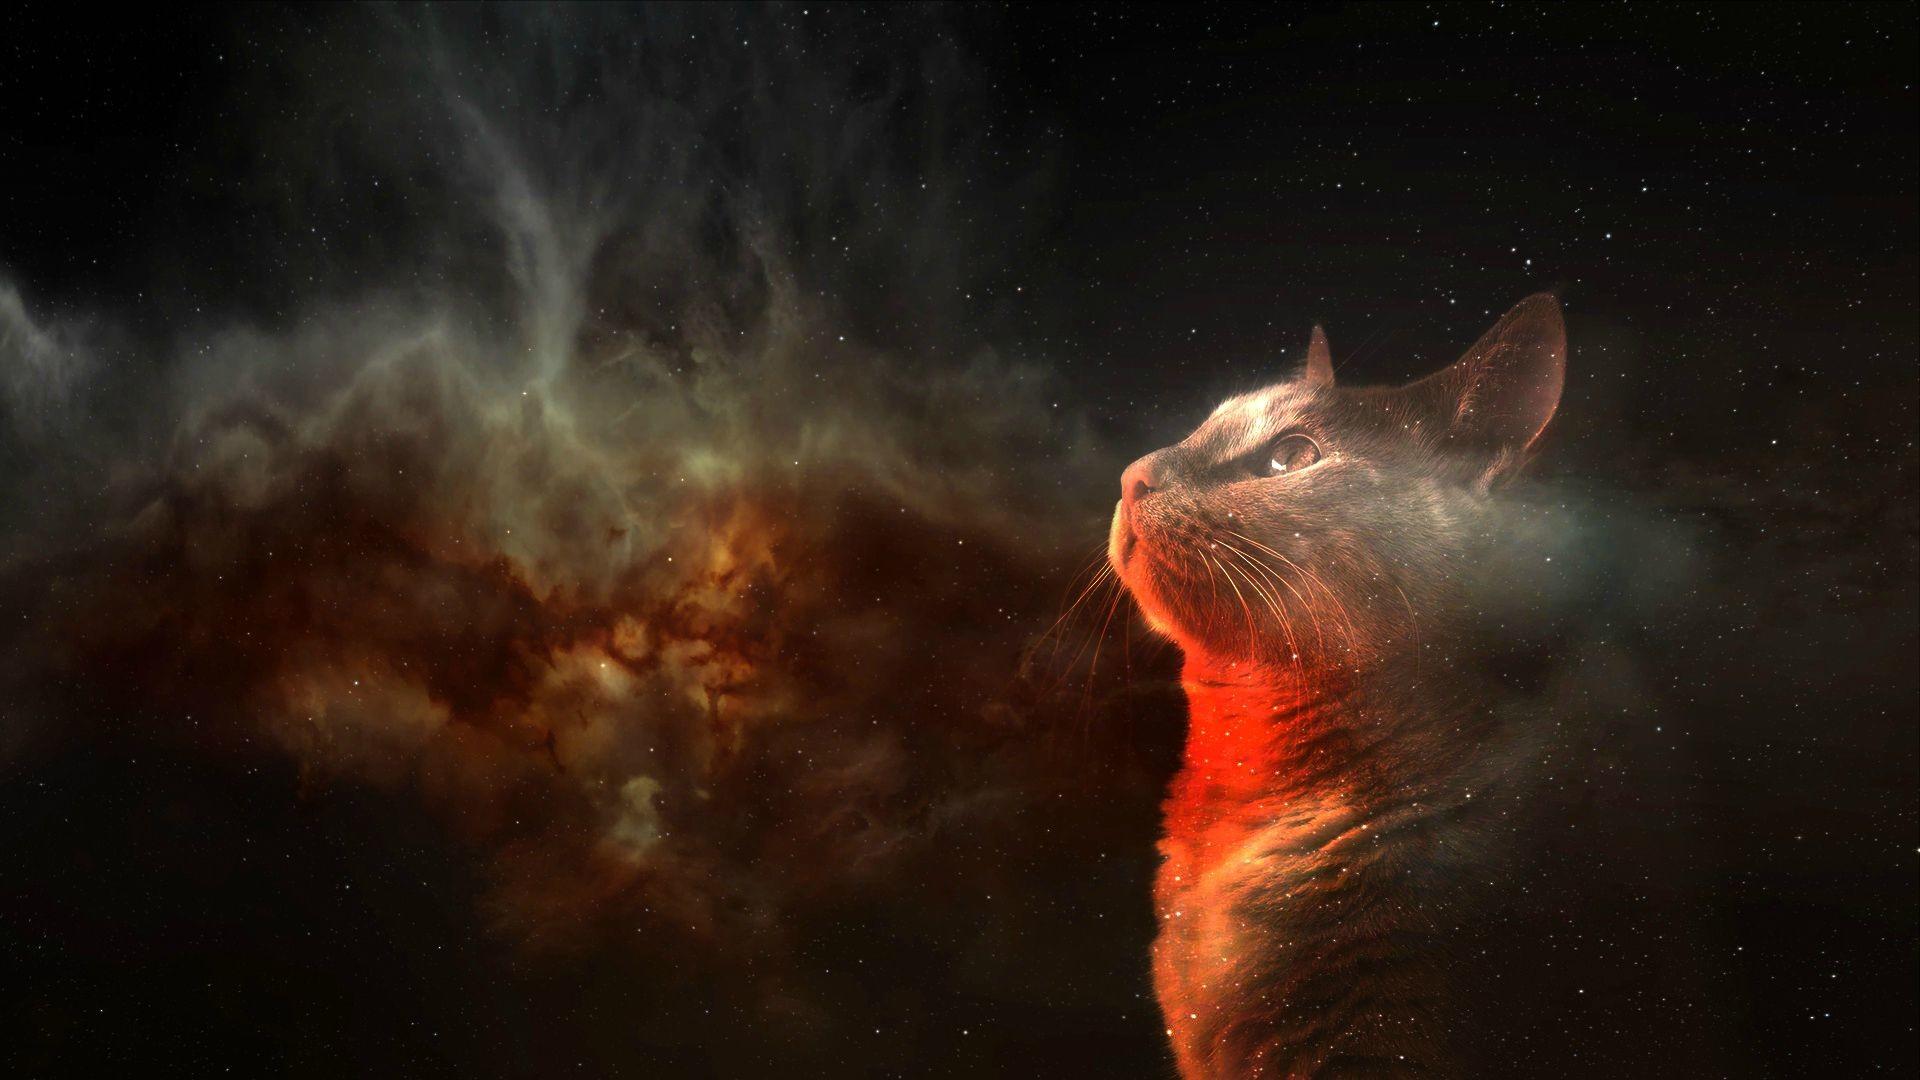 Res: 1920x1080, Humor - Cat Space Wallpaper